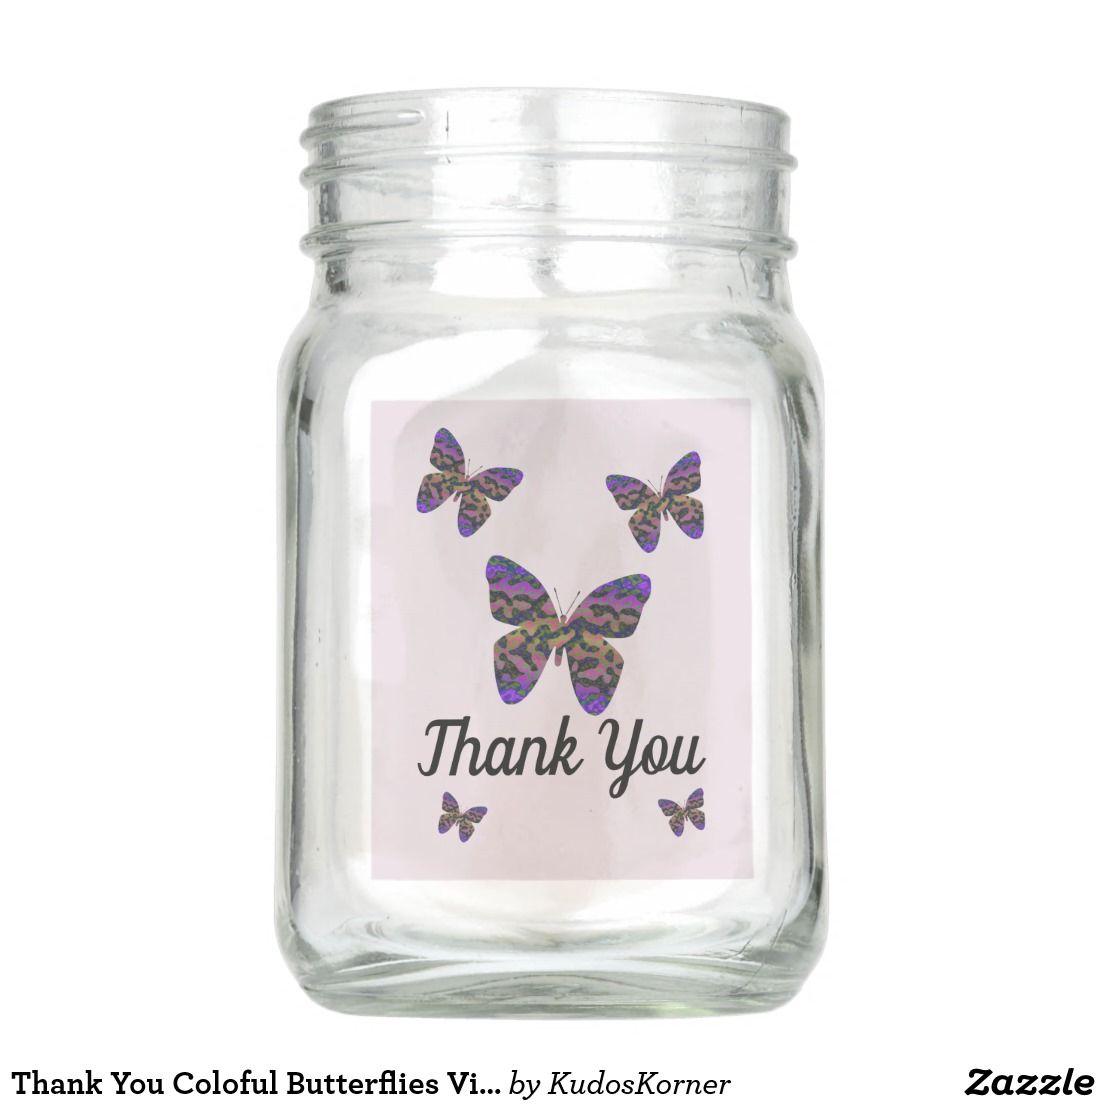 Thank You Coloful Butterflies Vibrant Appreciation Mason Jar